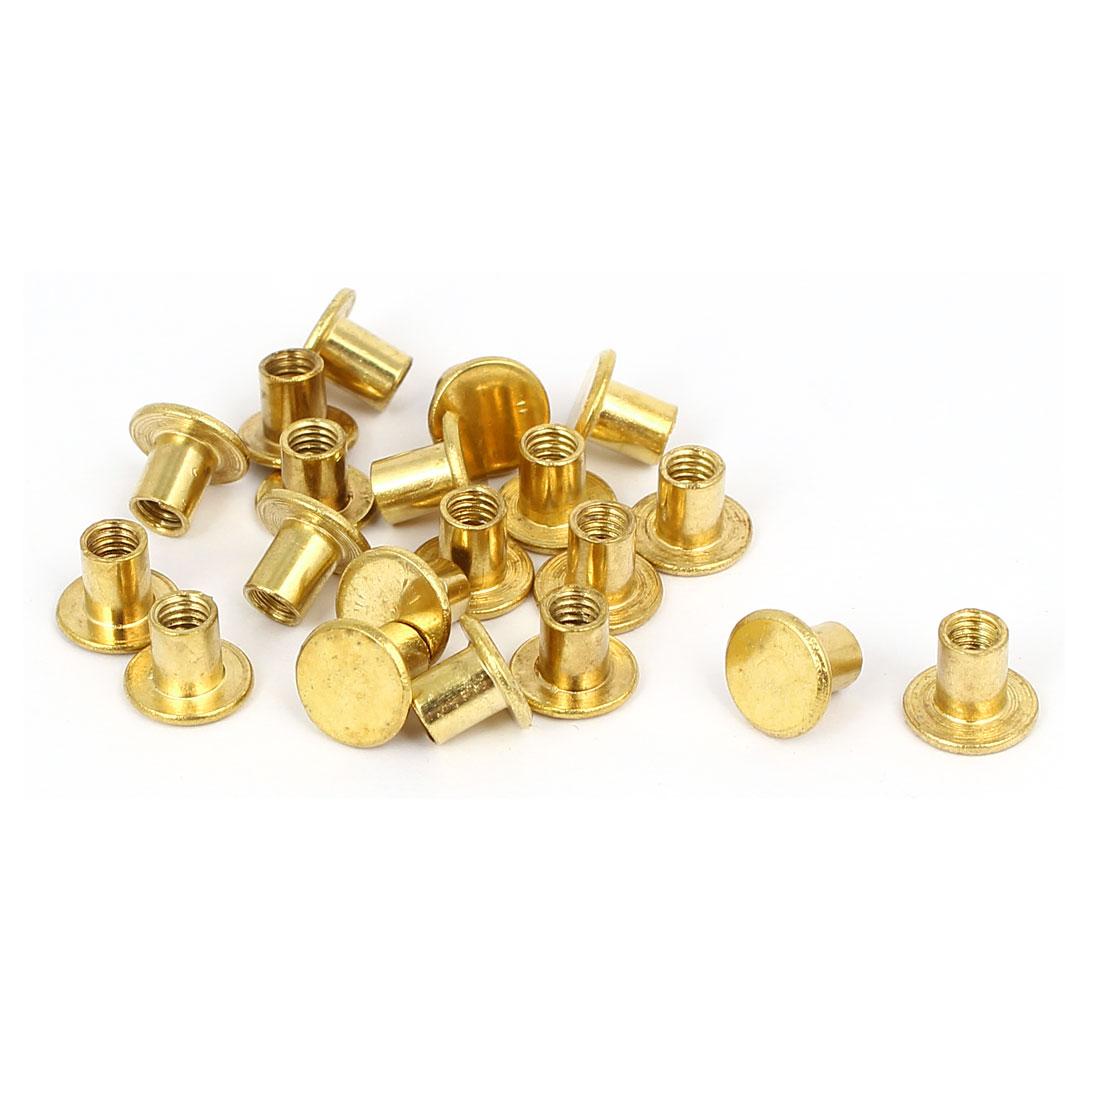 Photo Album Metal Brass Plated Binding Screw Post Barrel Nut 5mmx5.5mm 20pcs